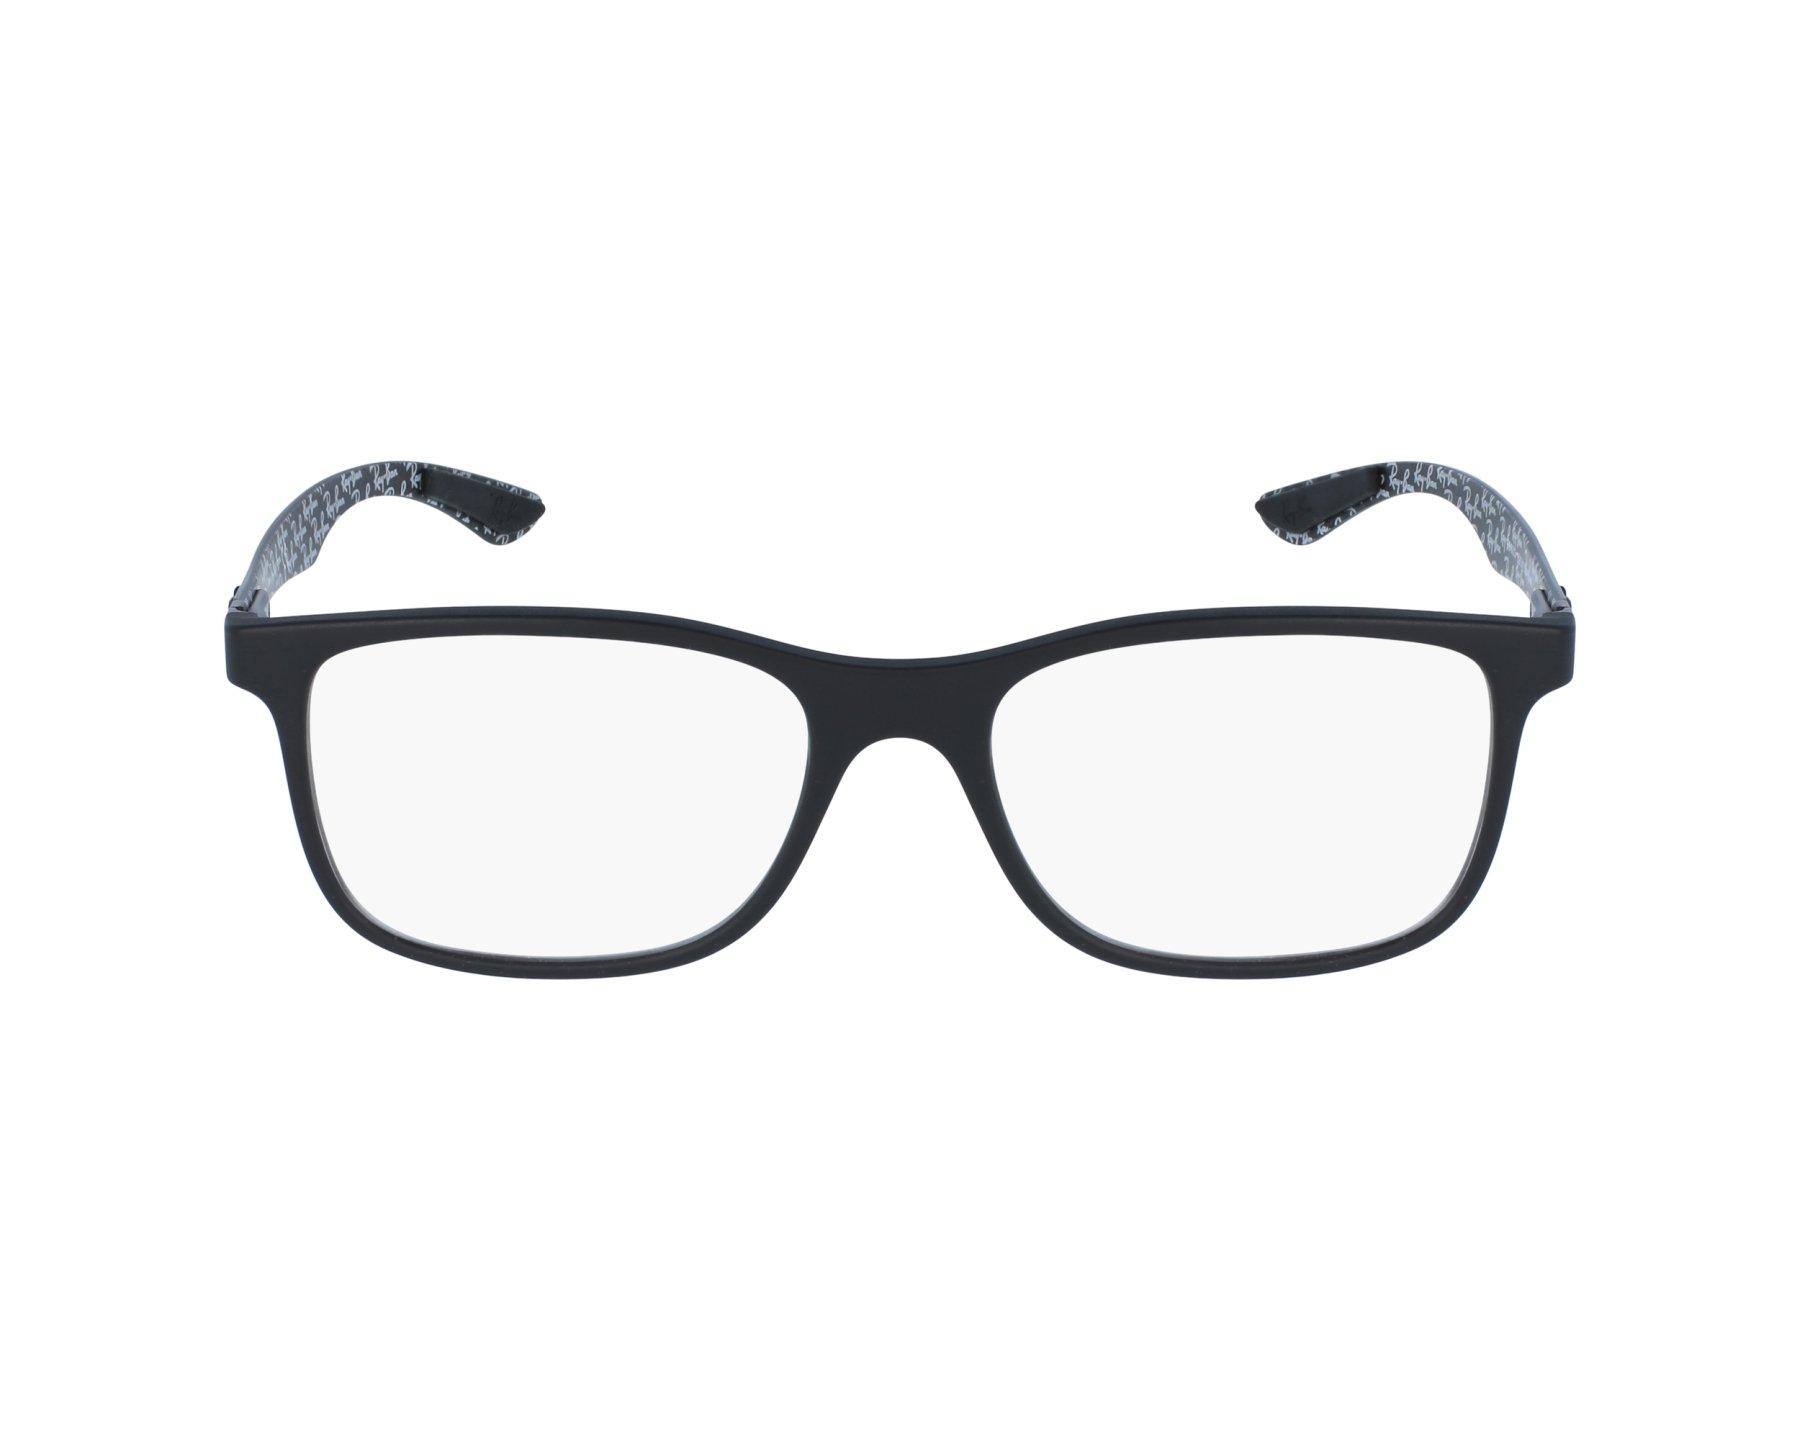 3ddbce0b57 eyeglasses Ray-Ban RX-8903 5263 53-18 Black Carbon profile view